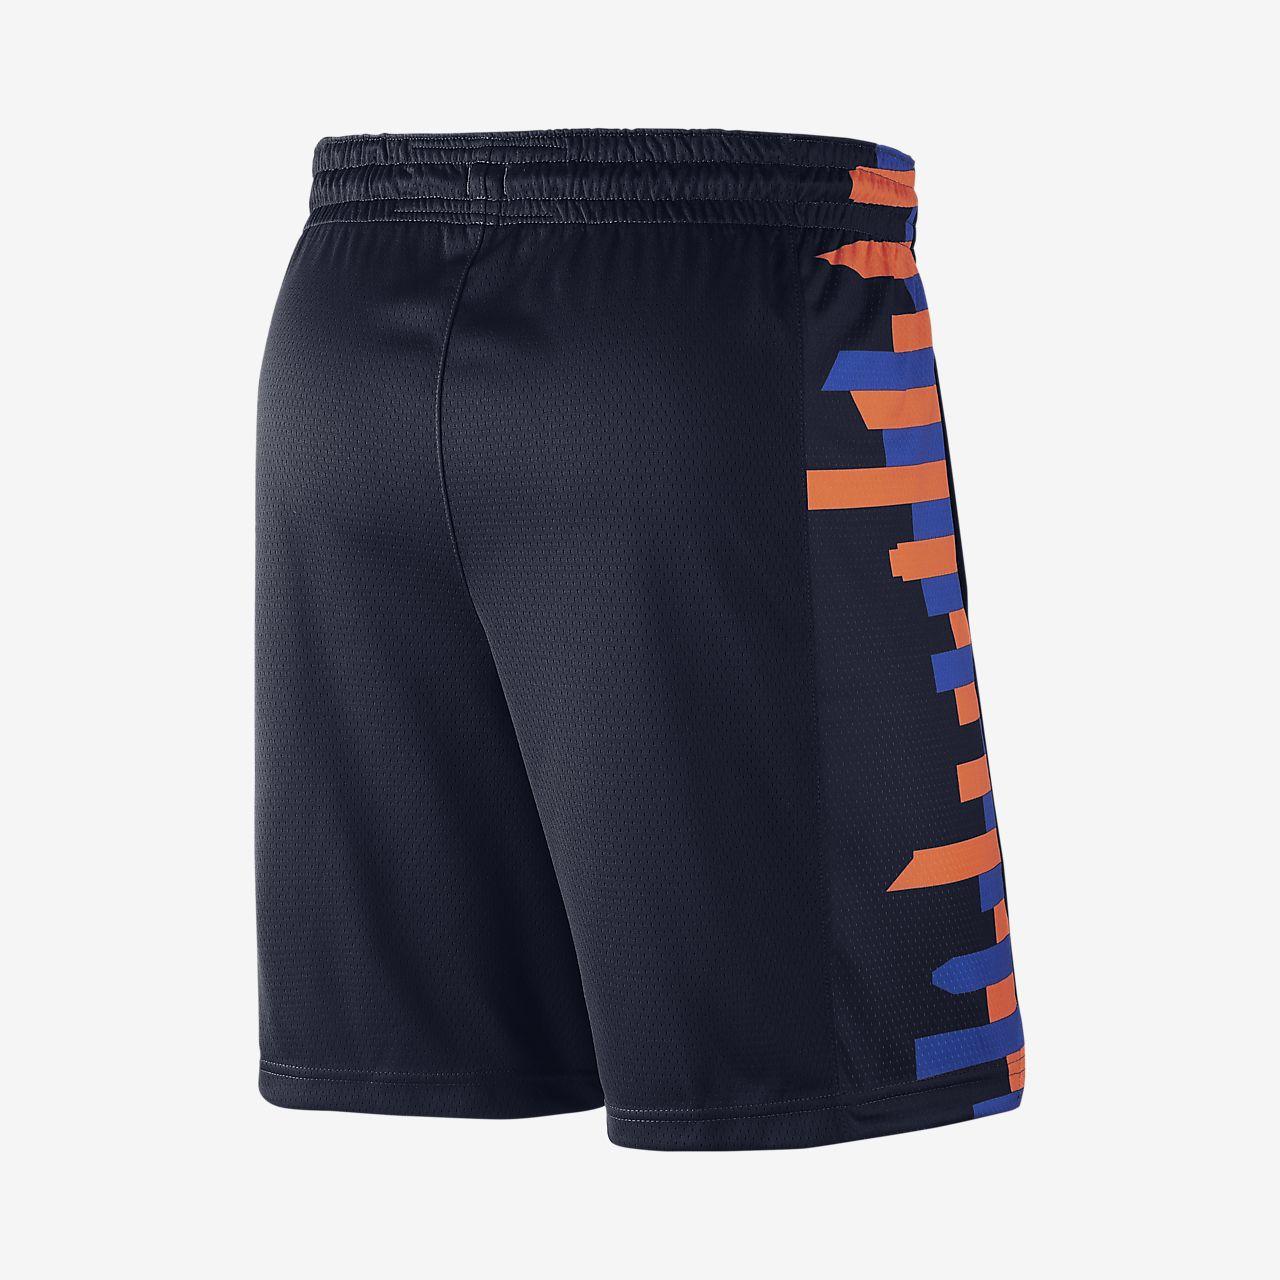 bc6c46b40fb New York Knicks City Edition Swingman Men s Nike NBA Shorts. Nike.com